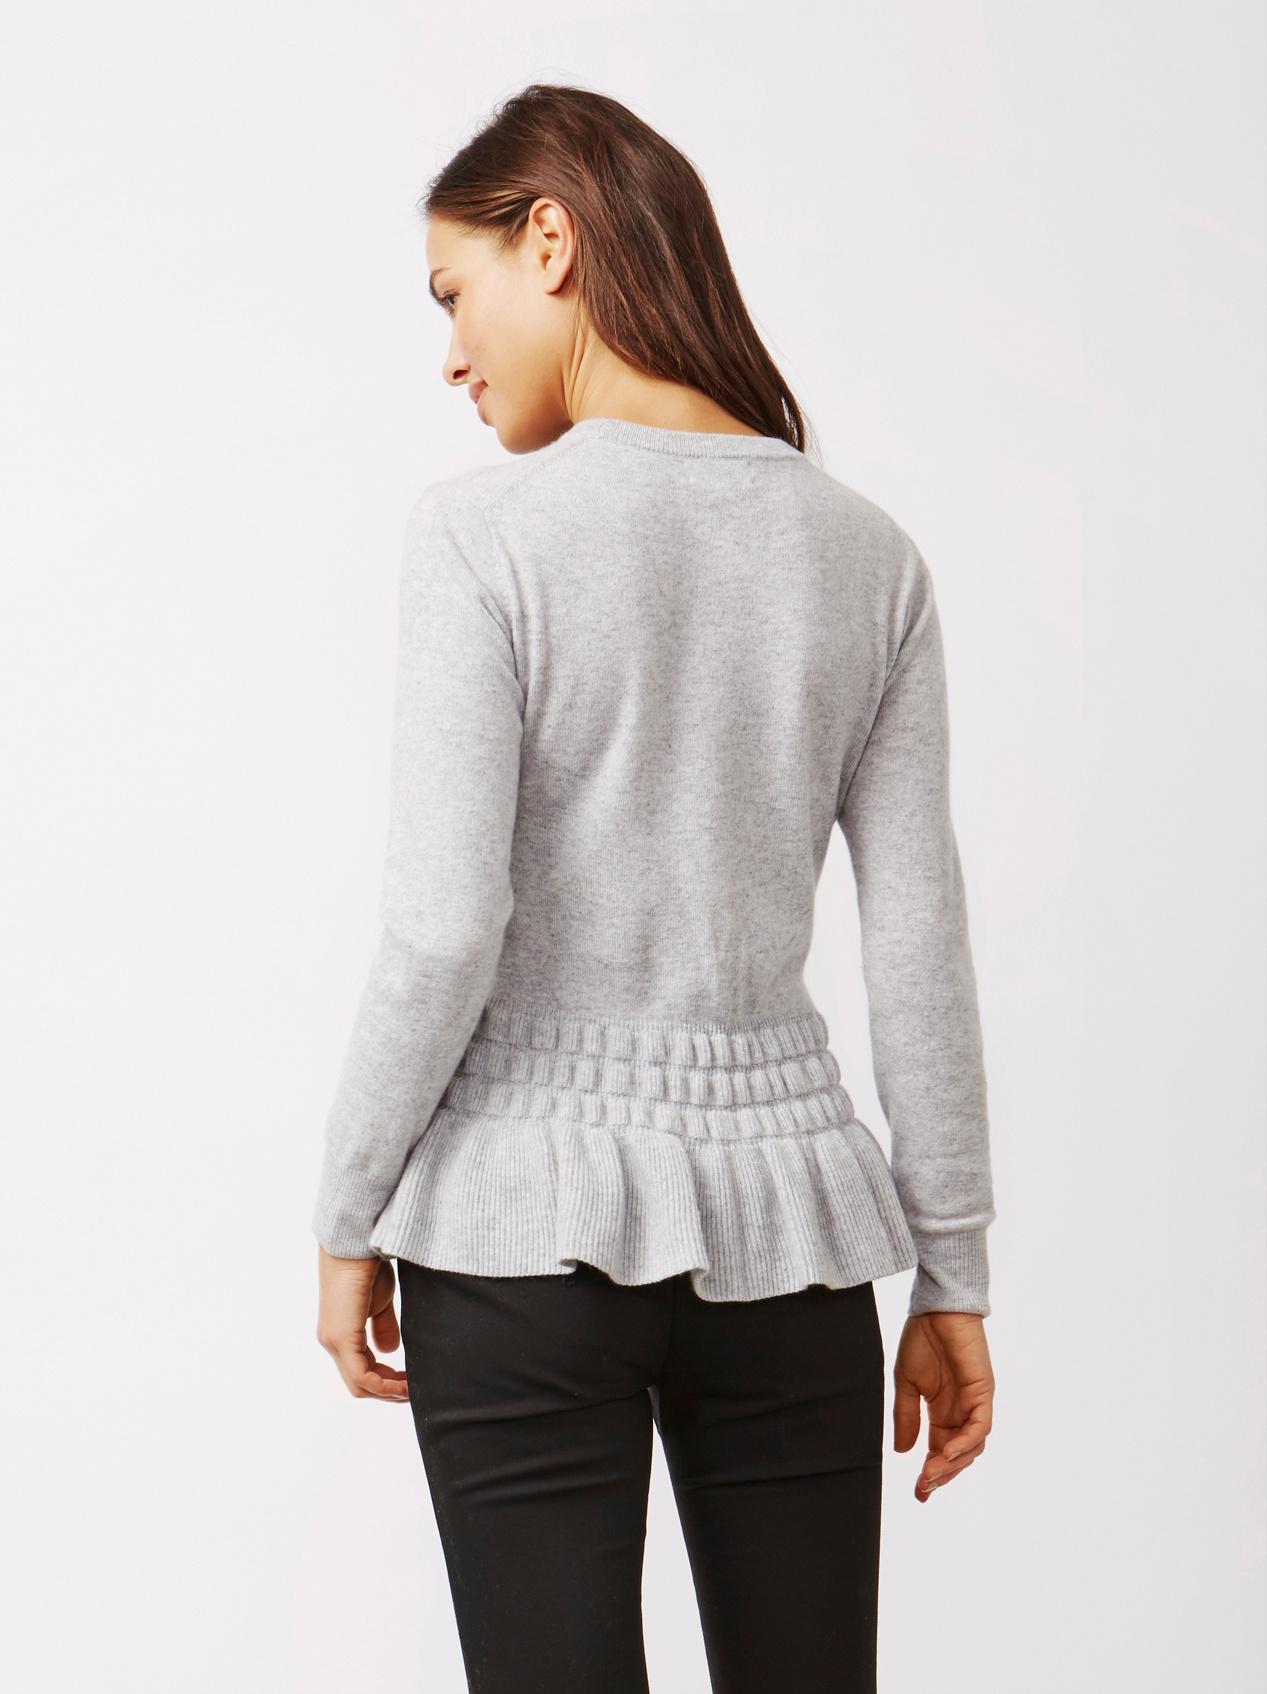 Soft Goat Women's Bottom Ruffle Sweater Light Grey